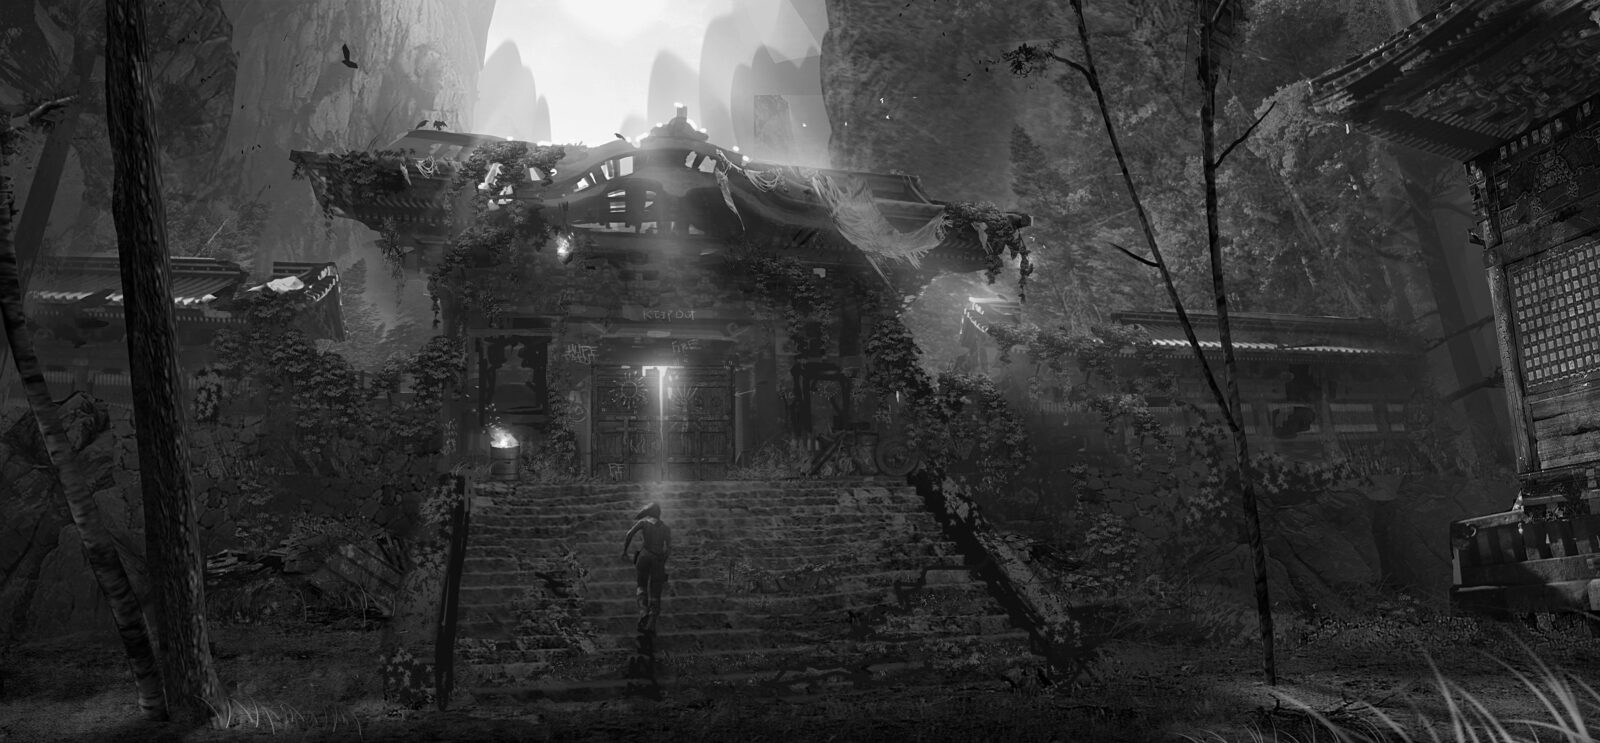 tomb raider 2013 lara croft concept art